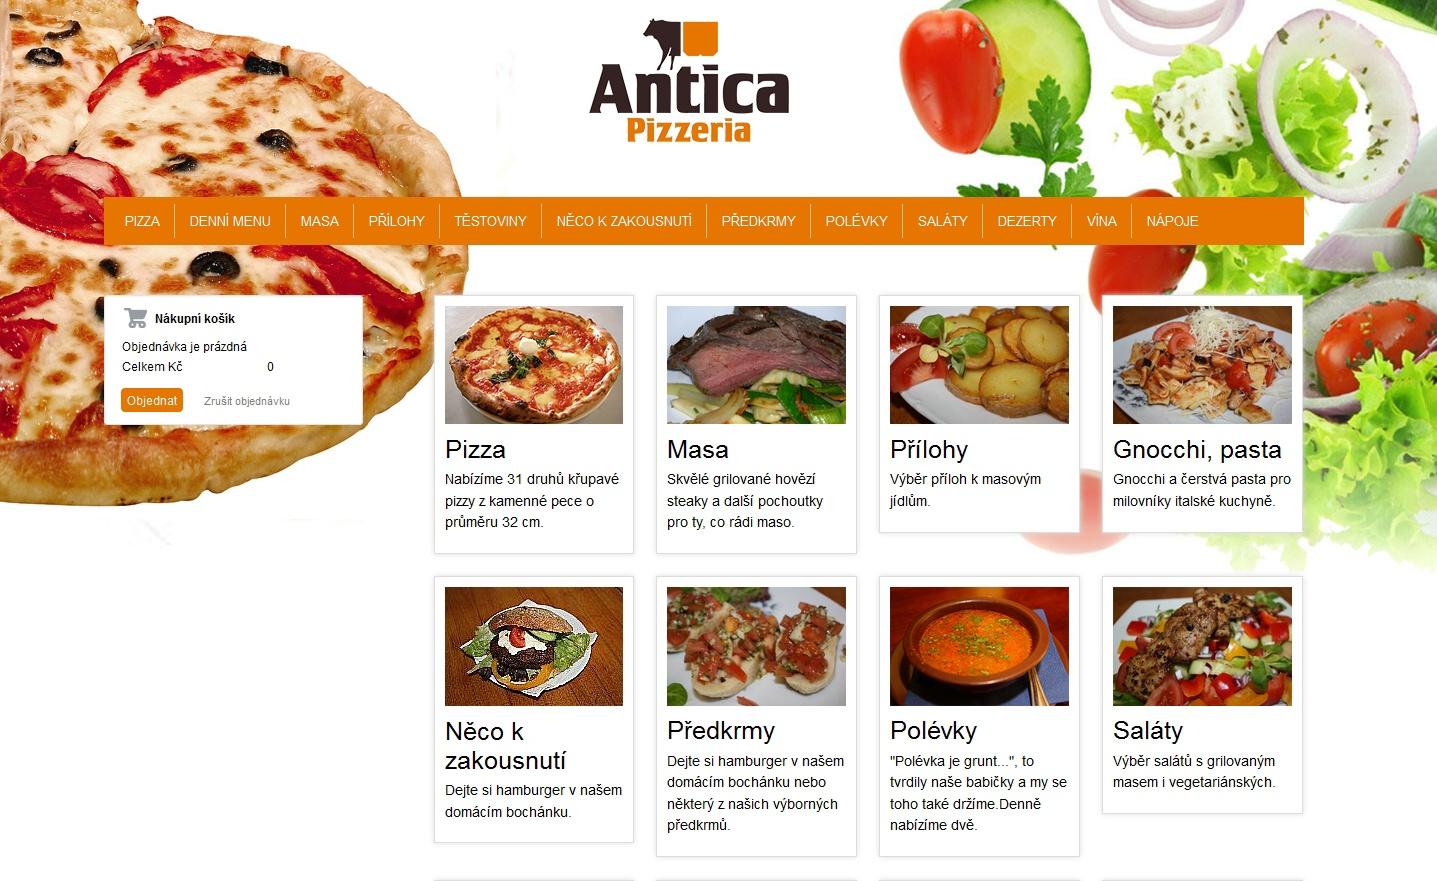 Pizzeria a pension Antica